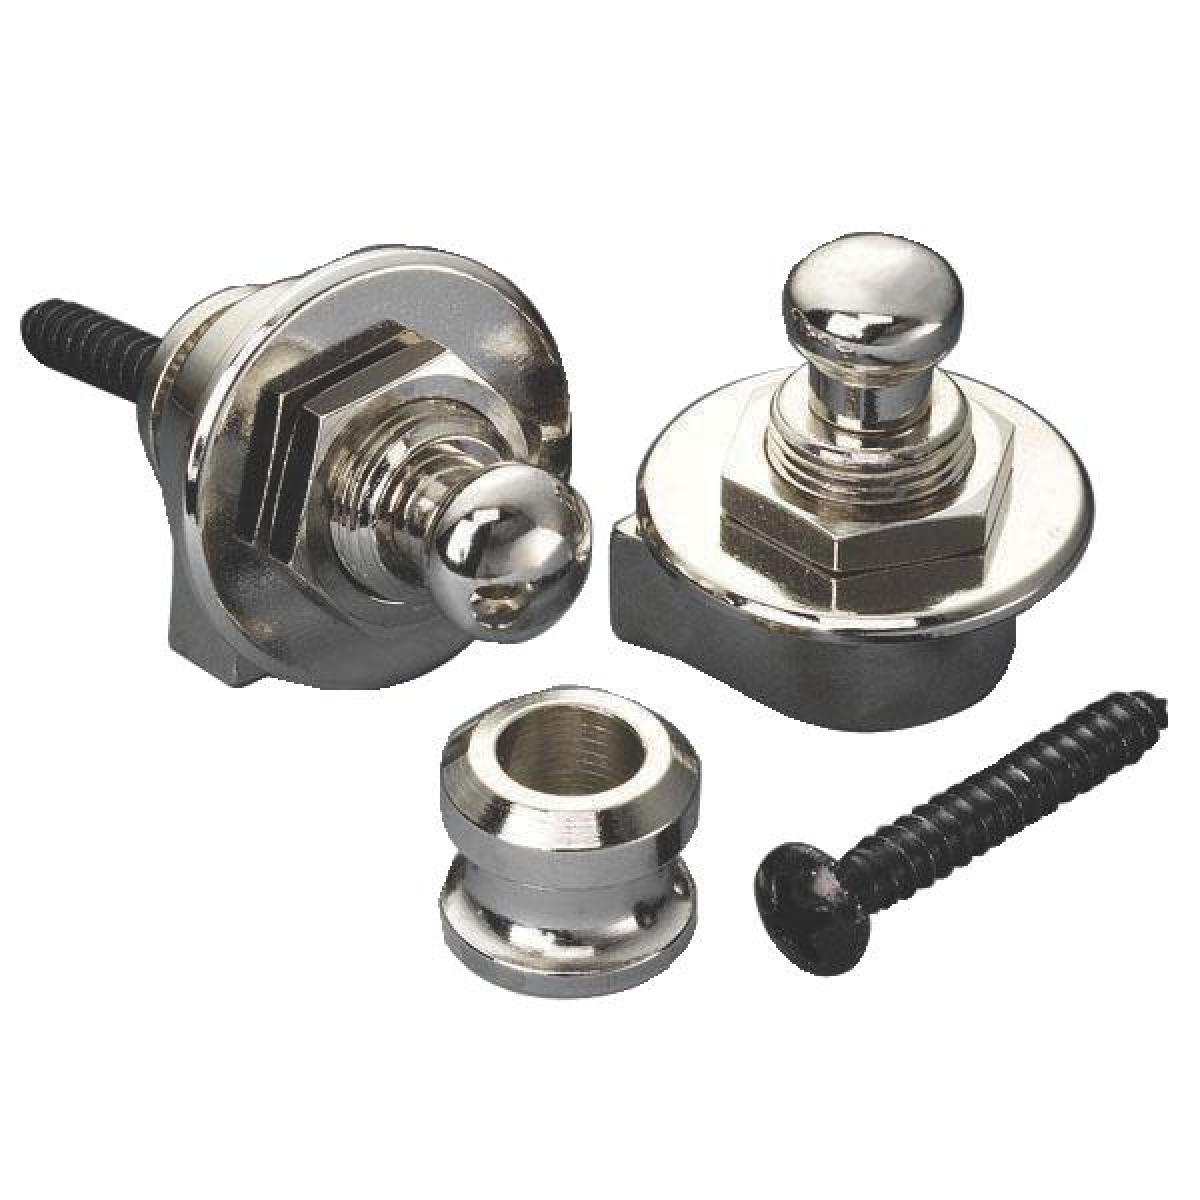 Security Locks With Nickel Finish (Pair)